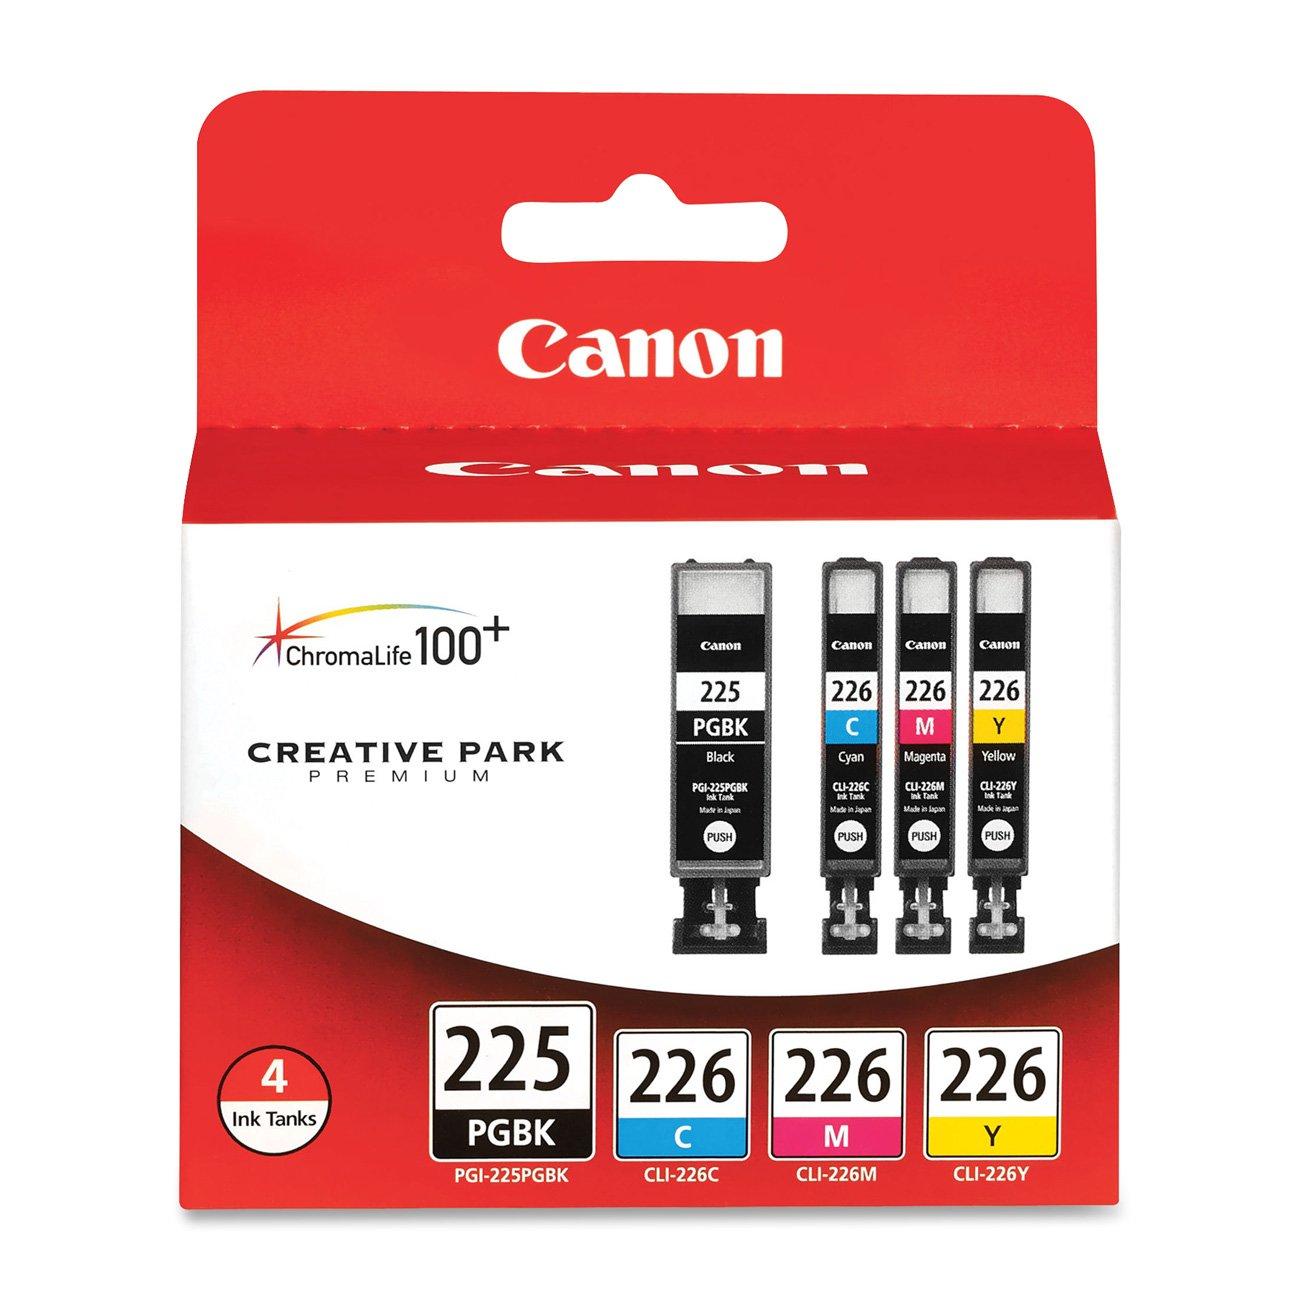 Canon PGI-225 Printer Ink Cartridge (4530B008)